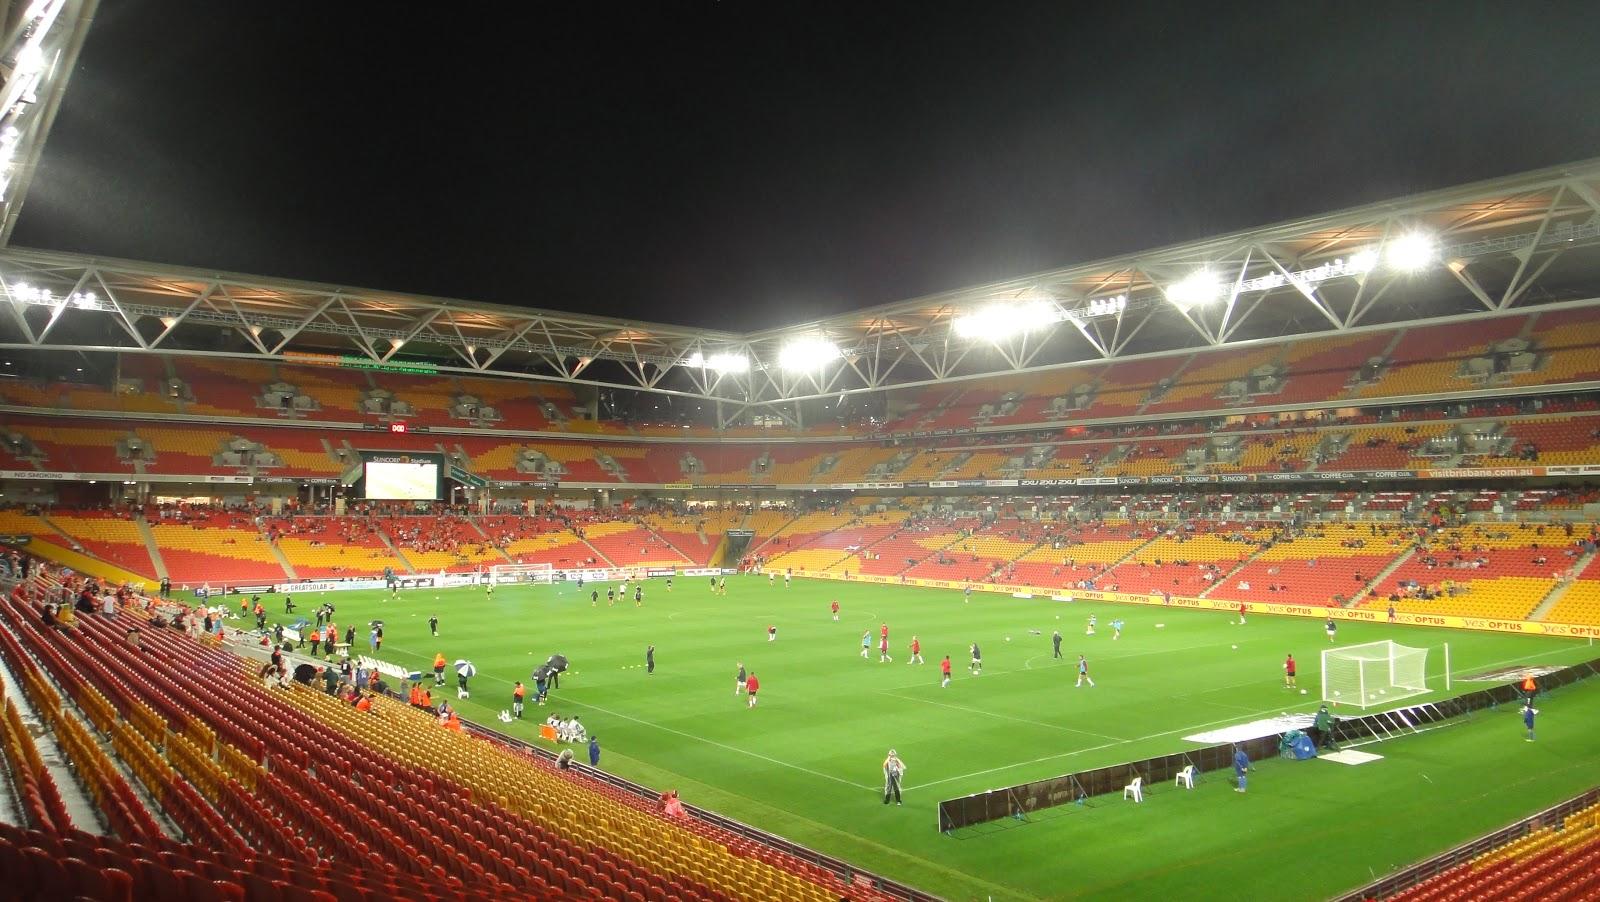 suncorp stadium - photo #26